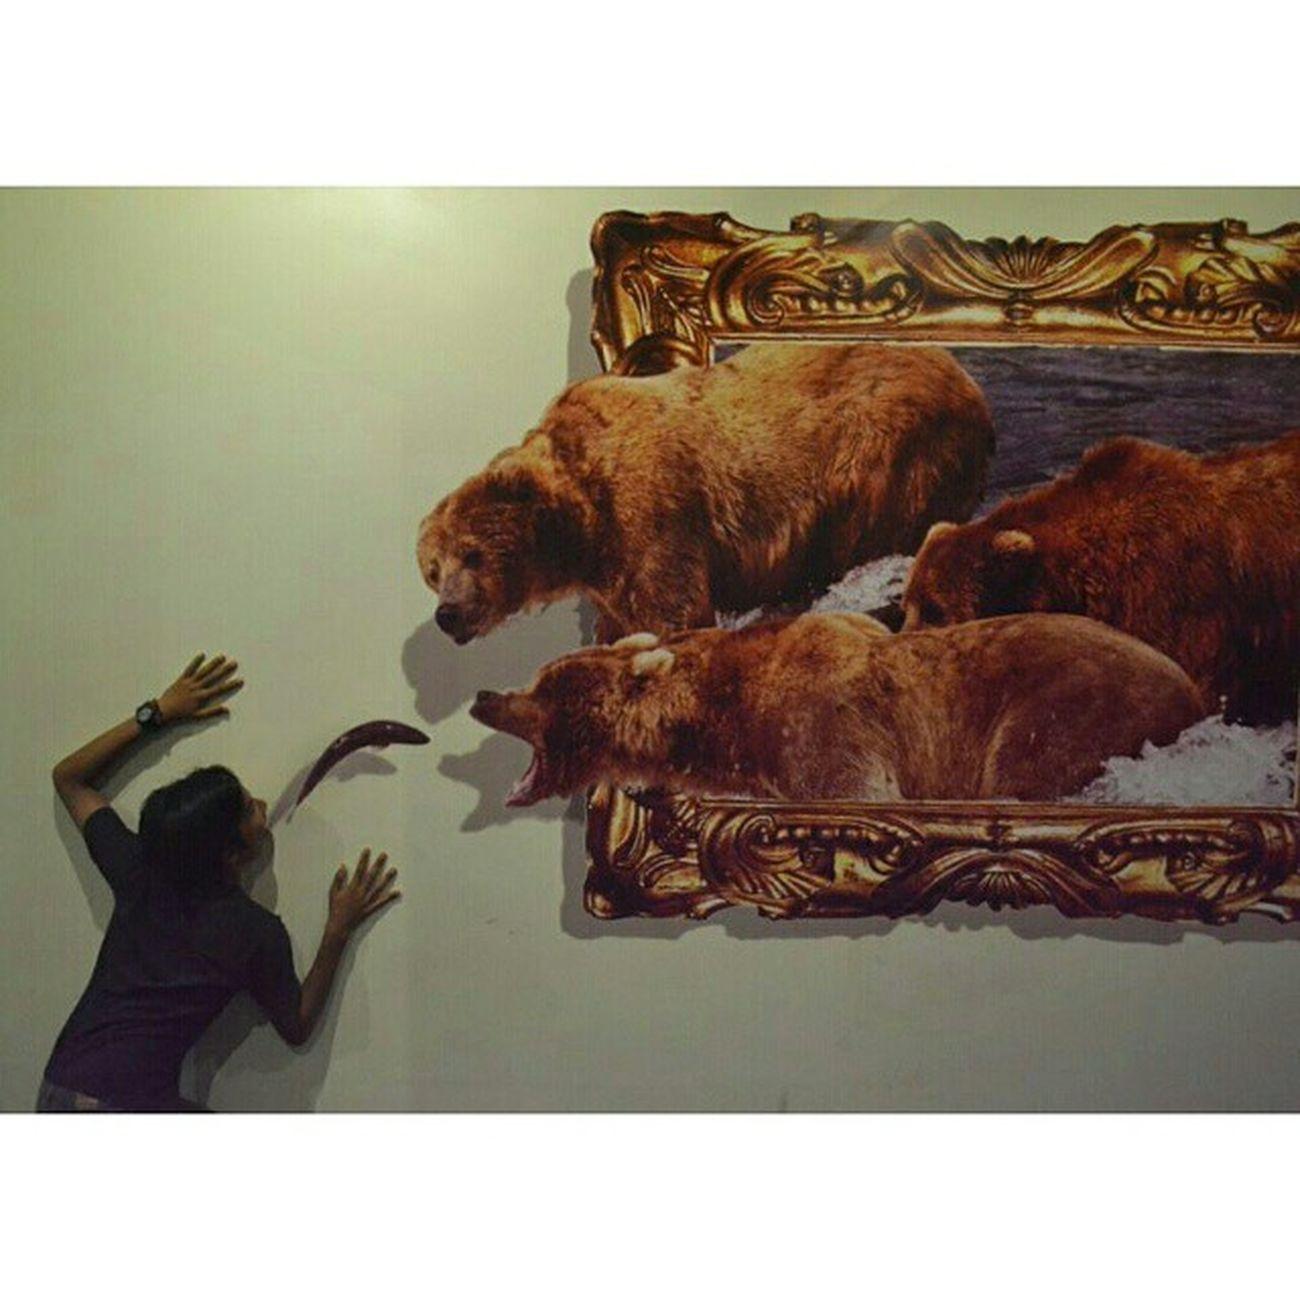 Fiiiissshhhh 😲 Beruang Xtsquare Demata Trickeyemuseum 3D jogja loloftheday like4like